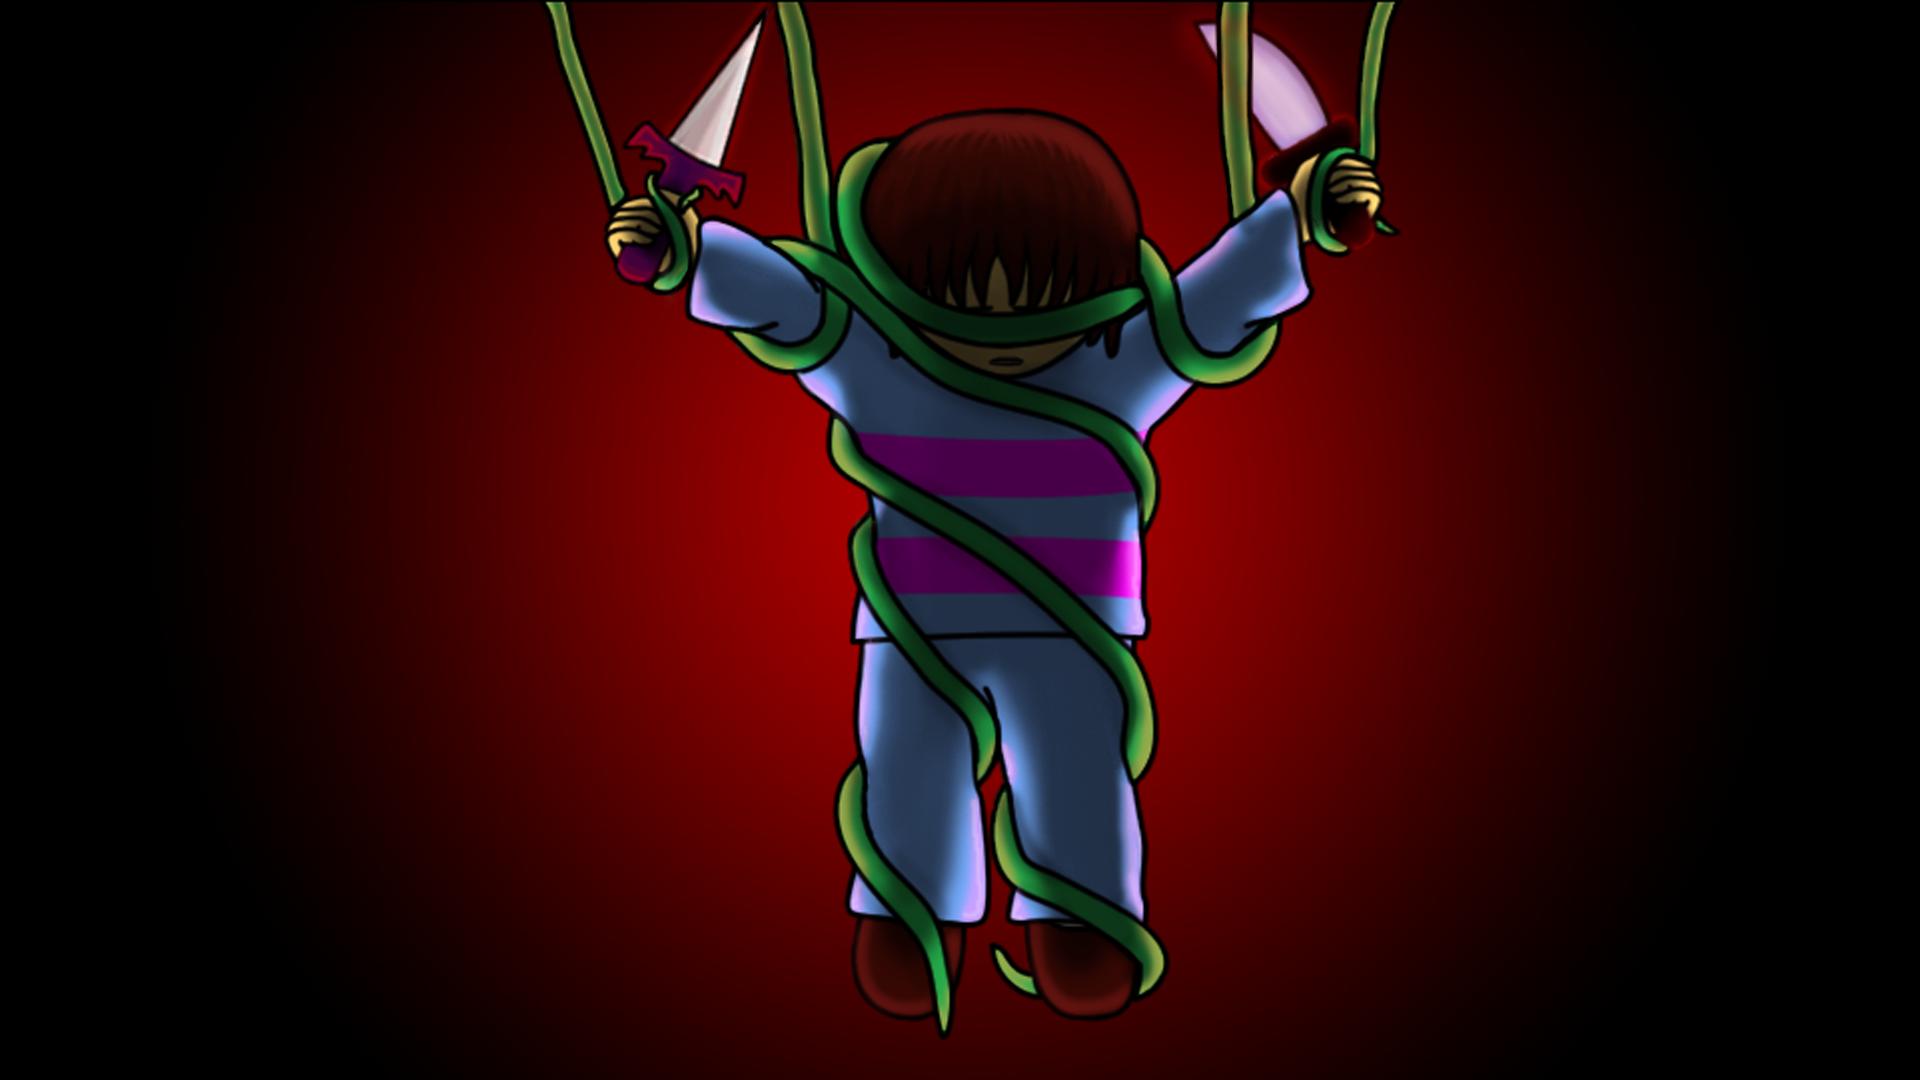 Dangling by Dark Threads by StephOBrien